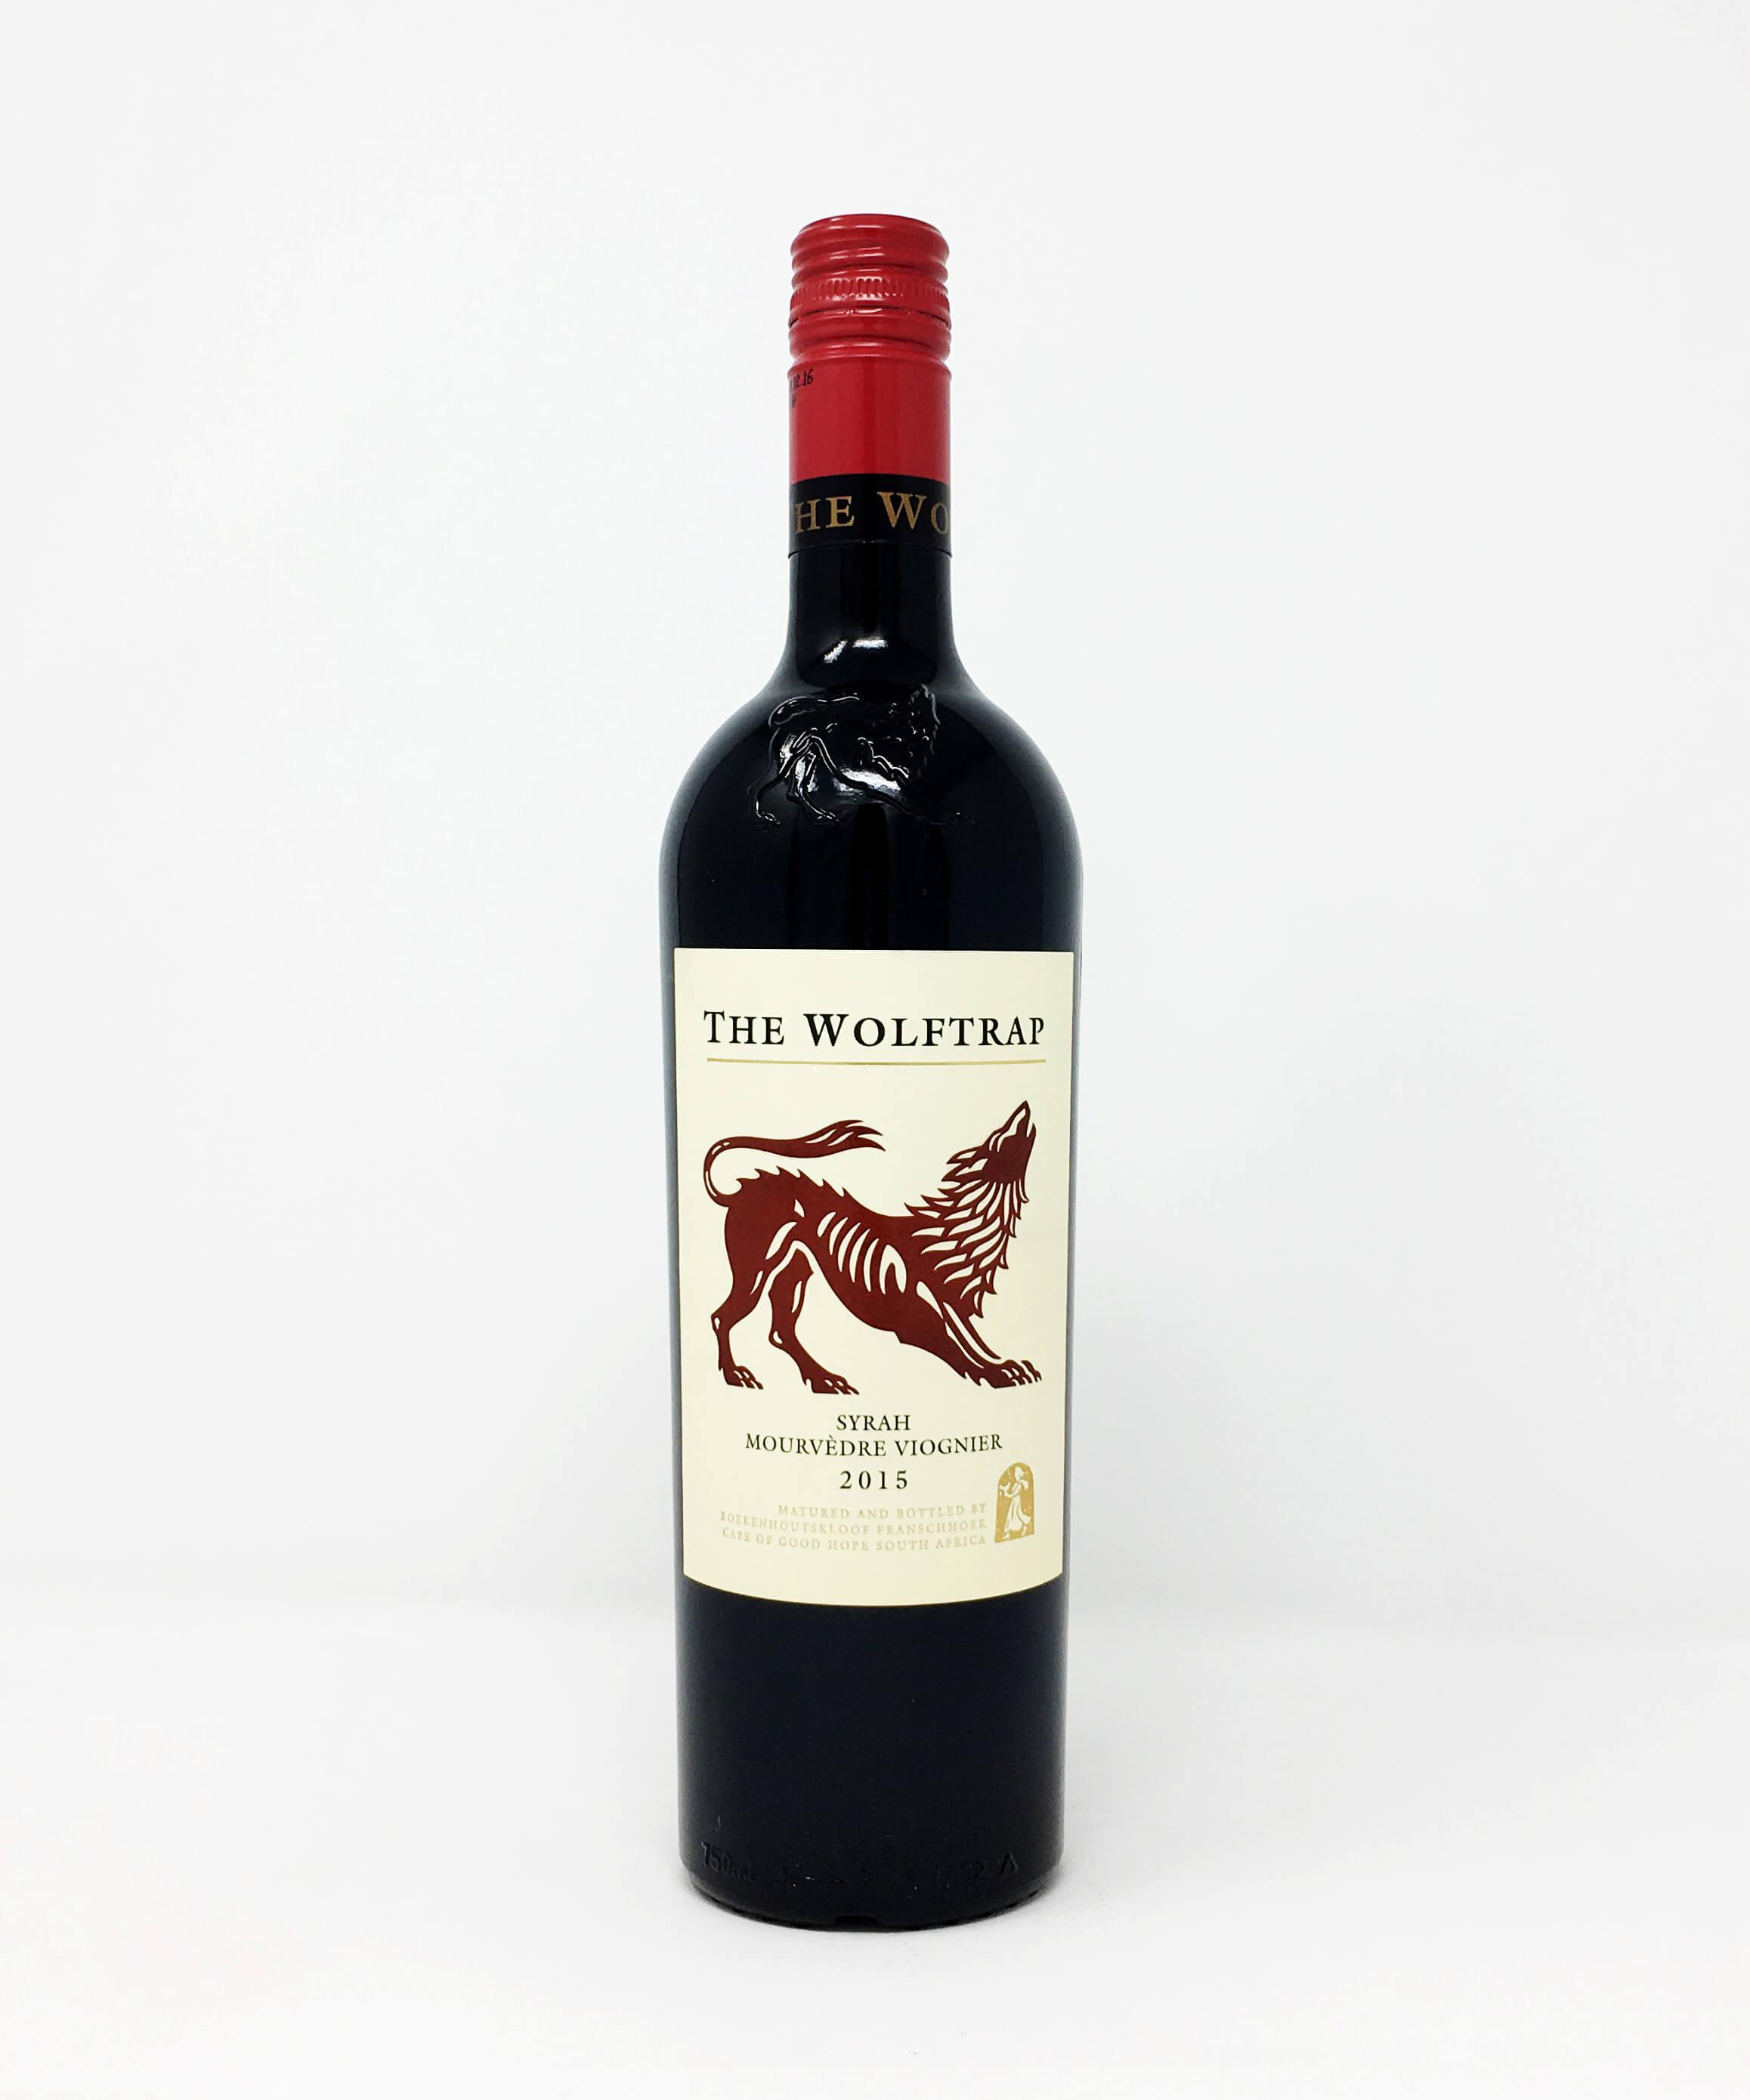 The Wolftrap Syrah-Mouvedre-Viognier